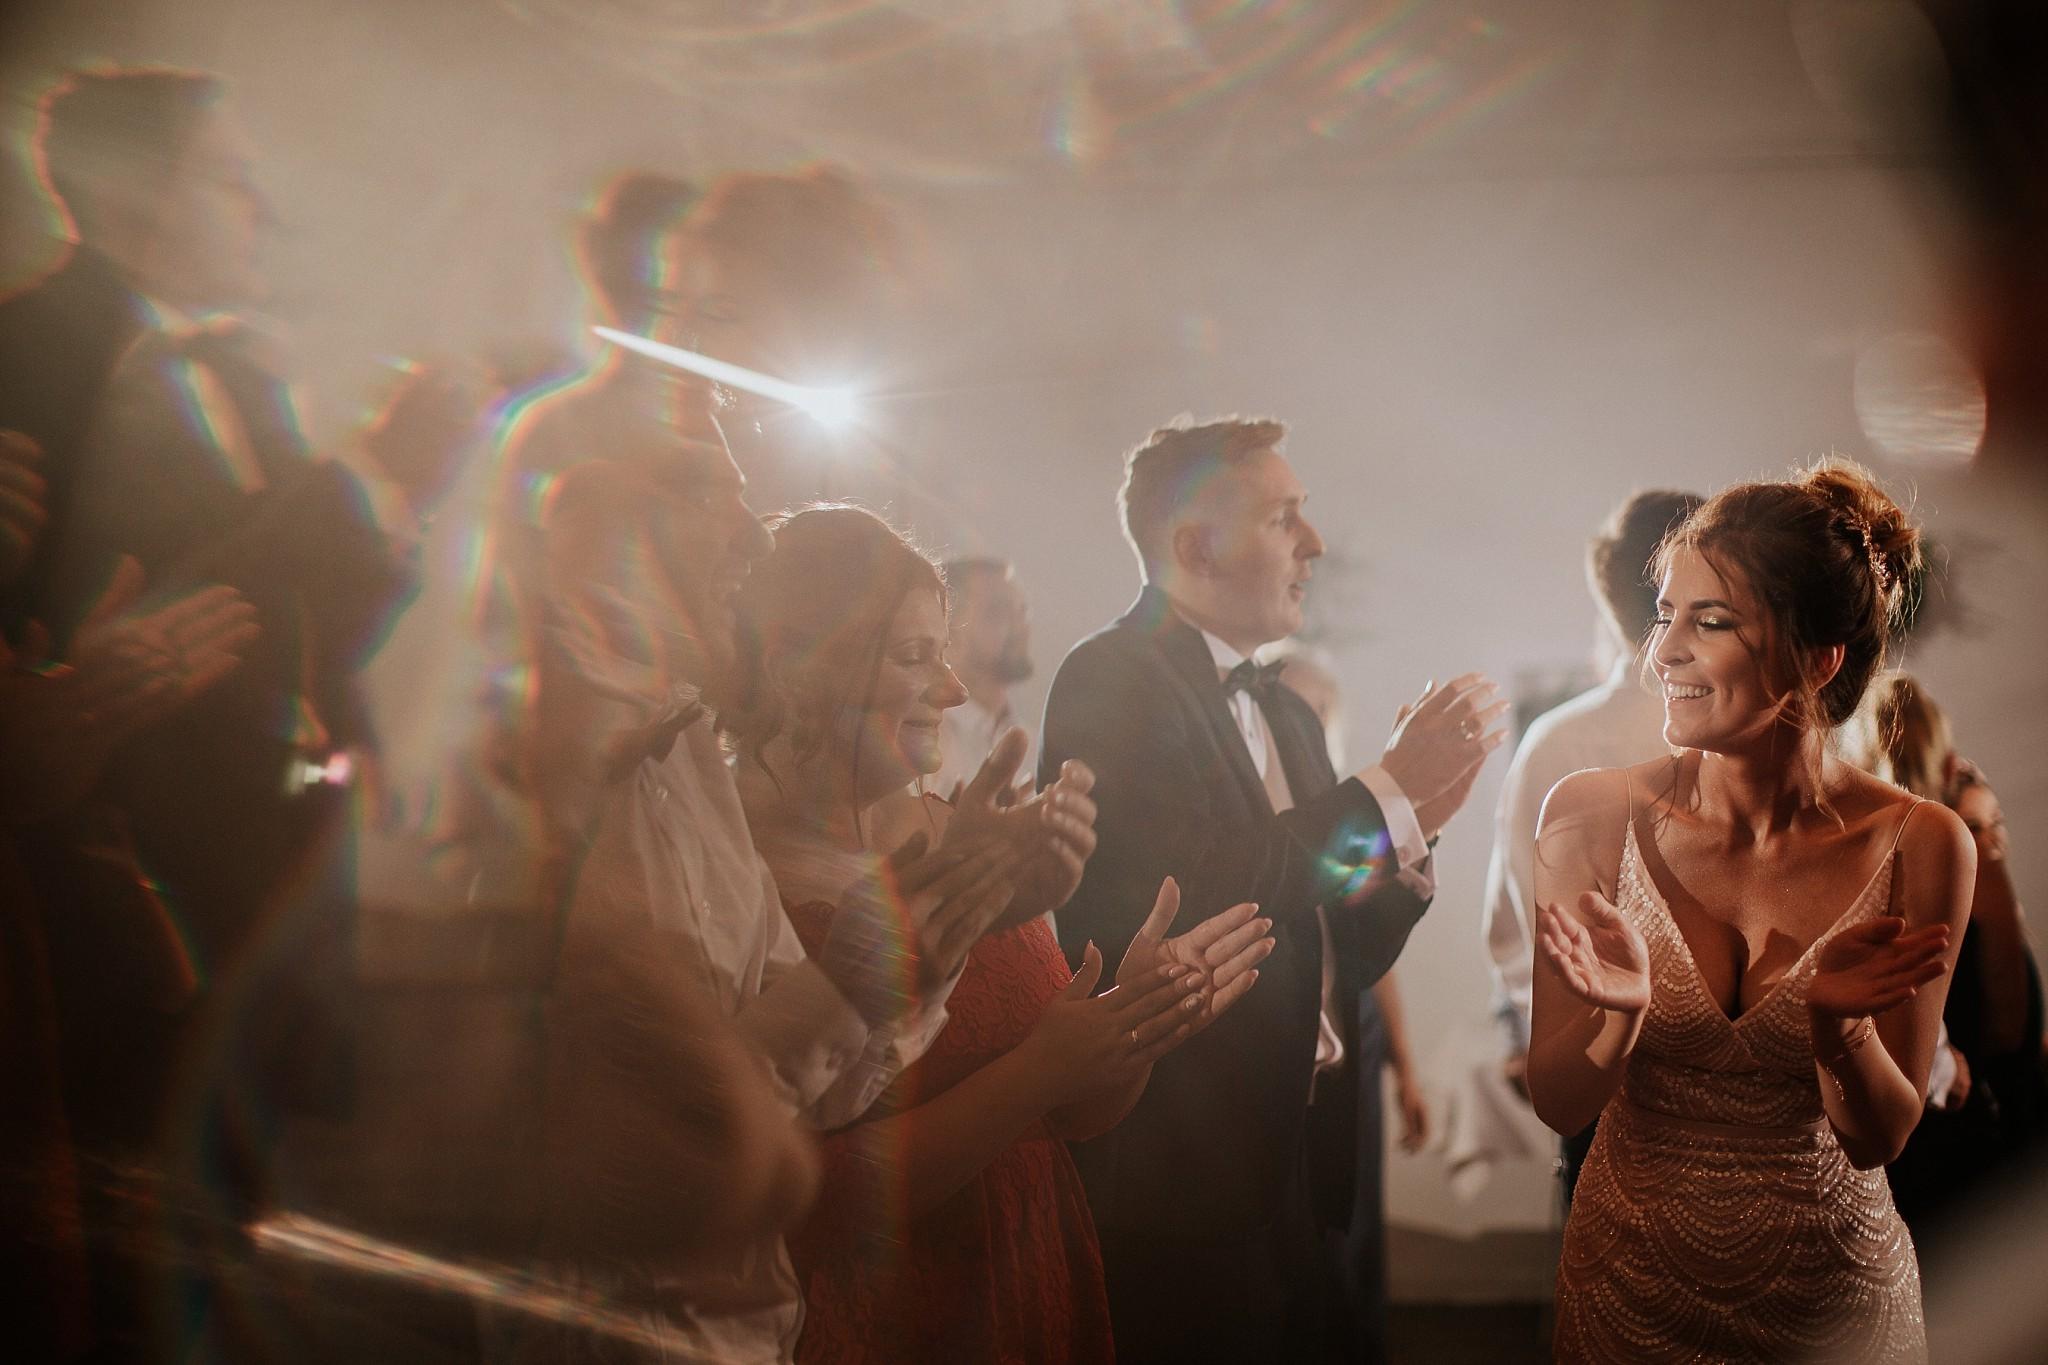 fotograf poznan wesele dobra truskawka piekne wesele pod poznaniem wesele w dobrej truskawce piekna para mloda slub marzen slub koronawirus slub listopad wesele koronawirus 460